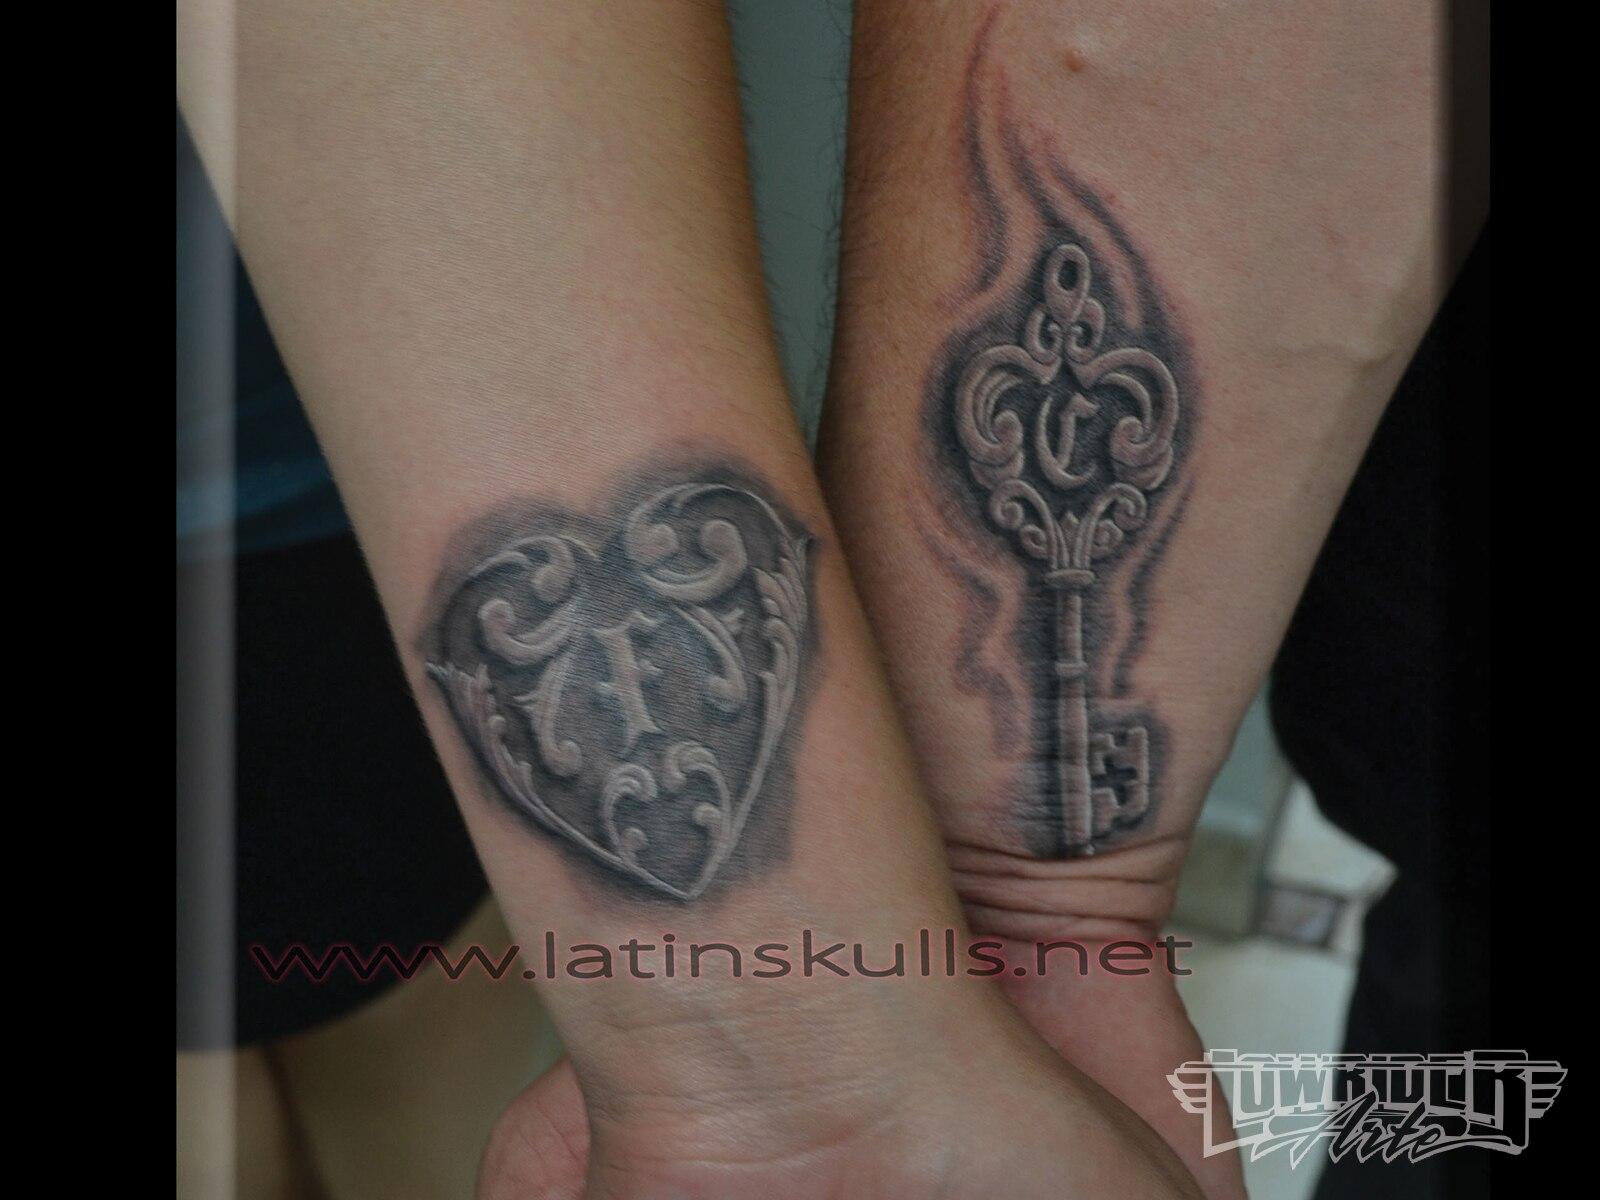 Latin skulls tattoo studio shop visit lowrider arte for Studio 7 tattoo